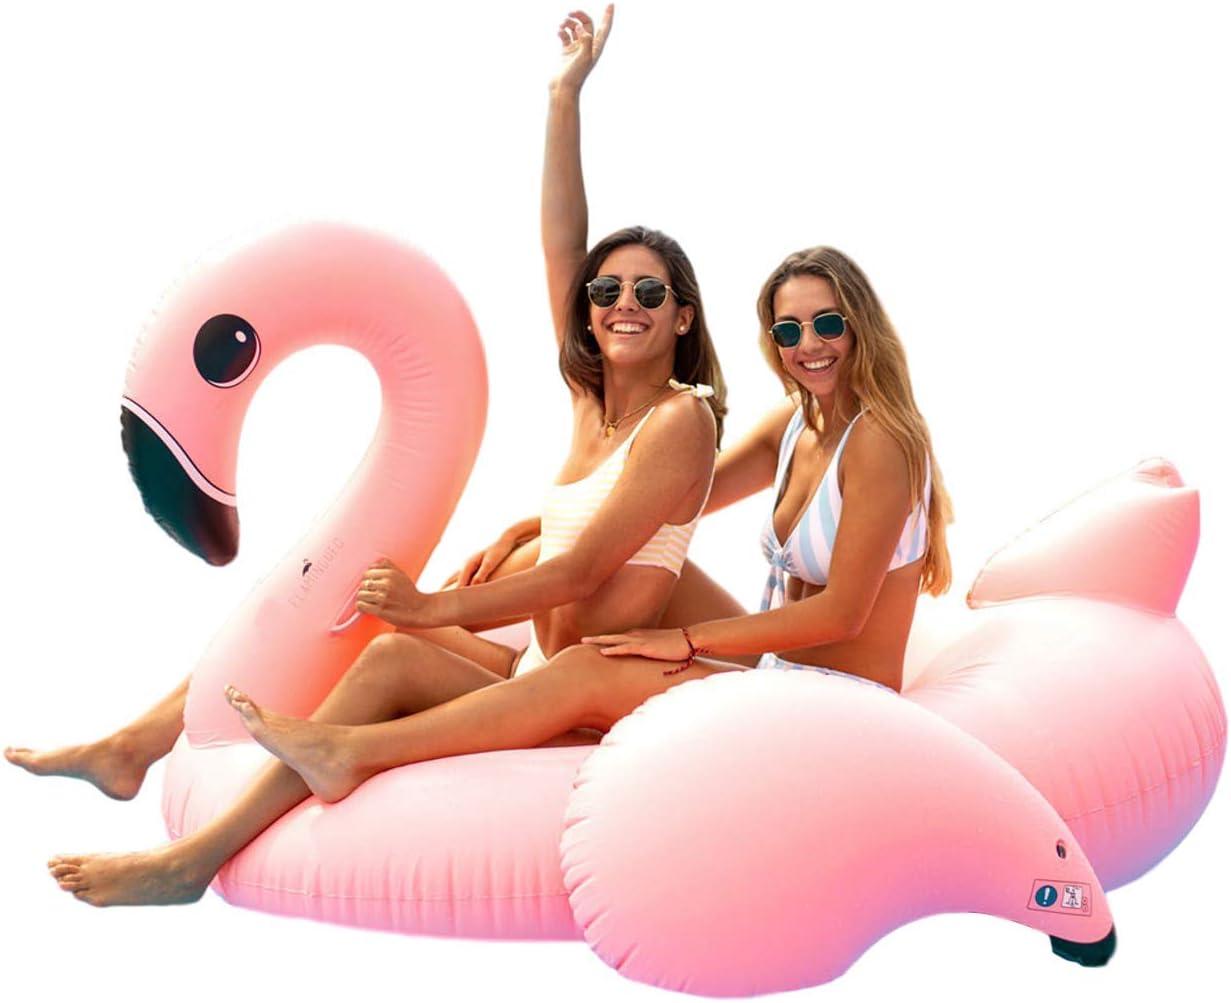 Flamingueo Flotador Gigante Flamenco - Colchoneta Piscina Flamenco, Colchoneta Hinchable Flamenco, Flotador Gigante, Flotador Adulto, Colchoneta Piscina, Hinchables Piscina, 120x115x100 cm